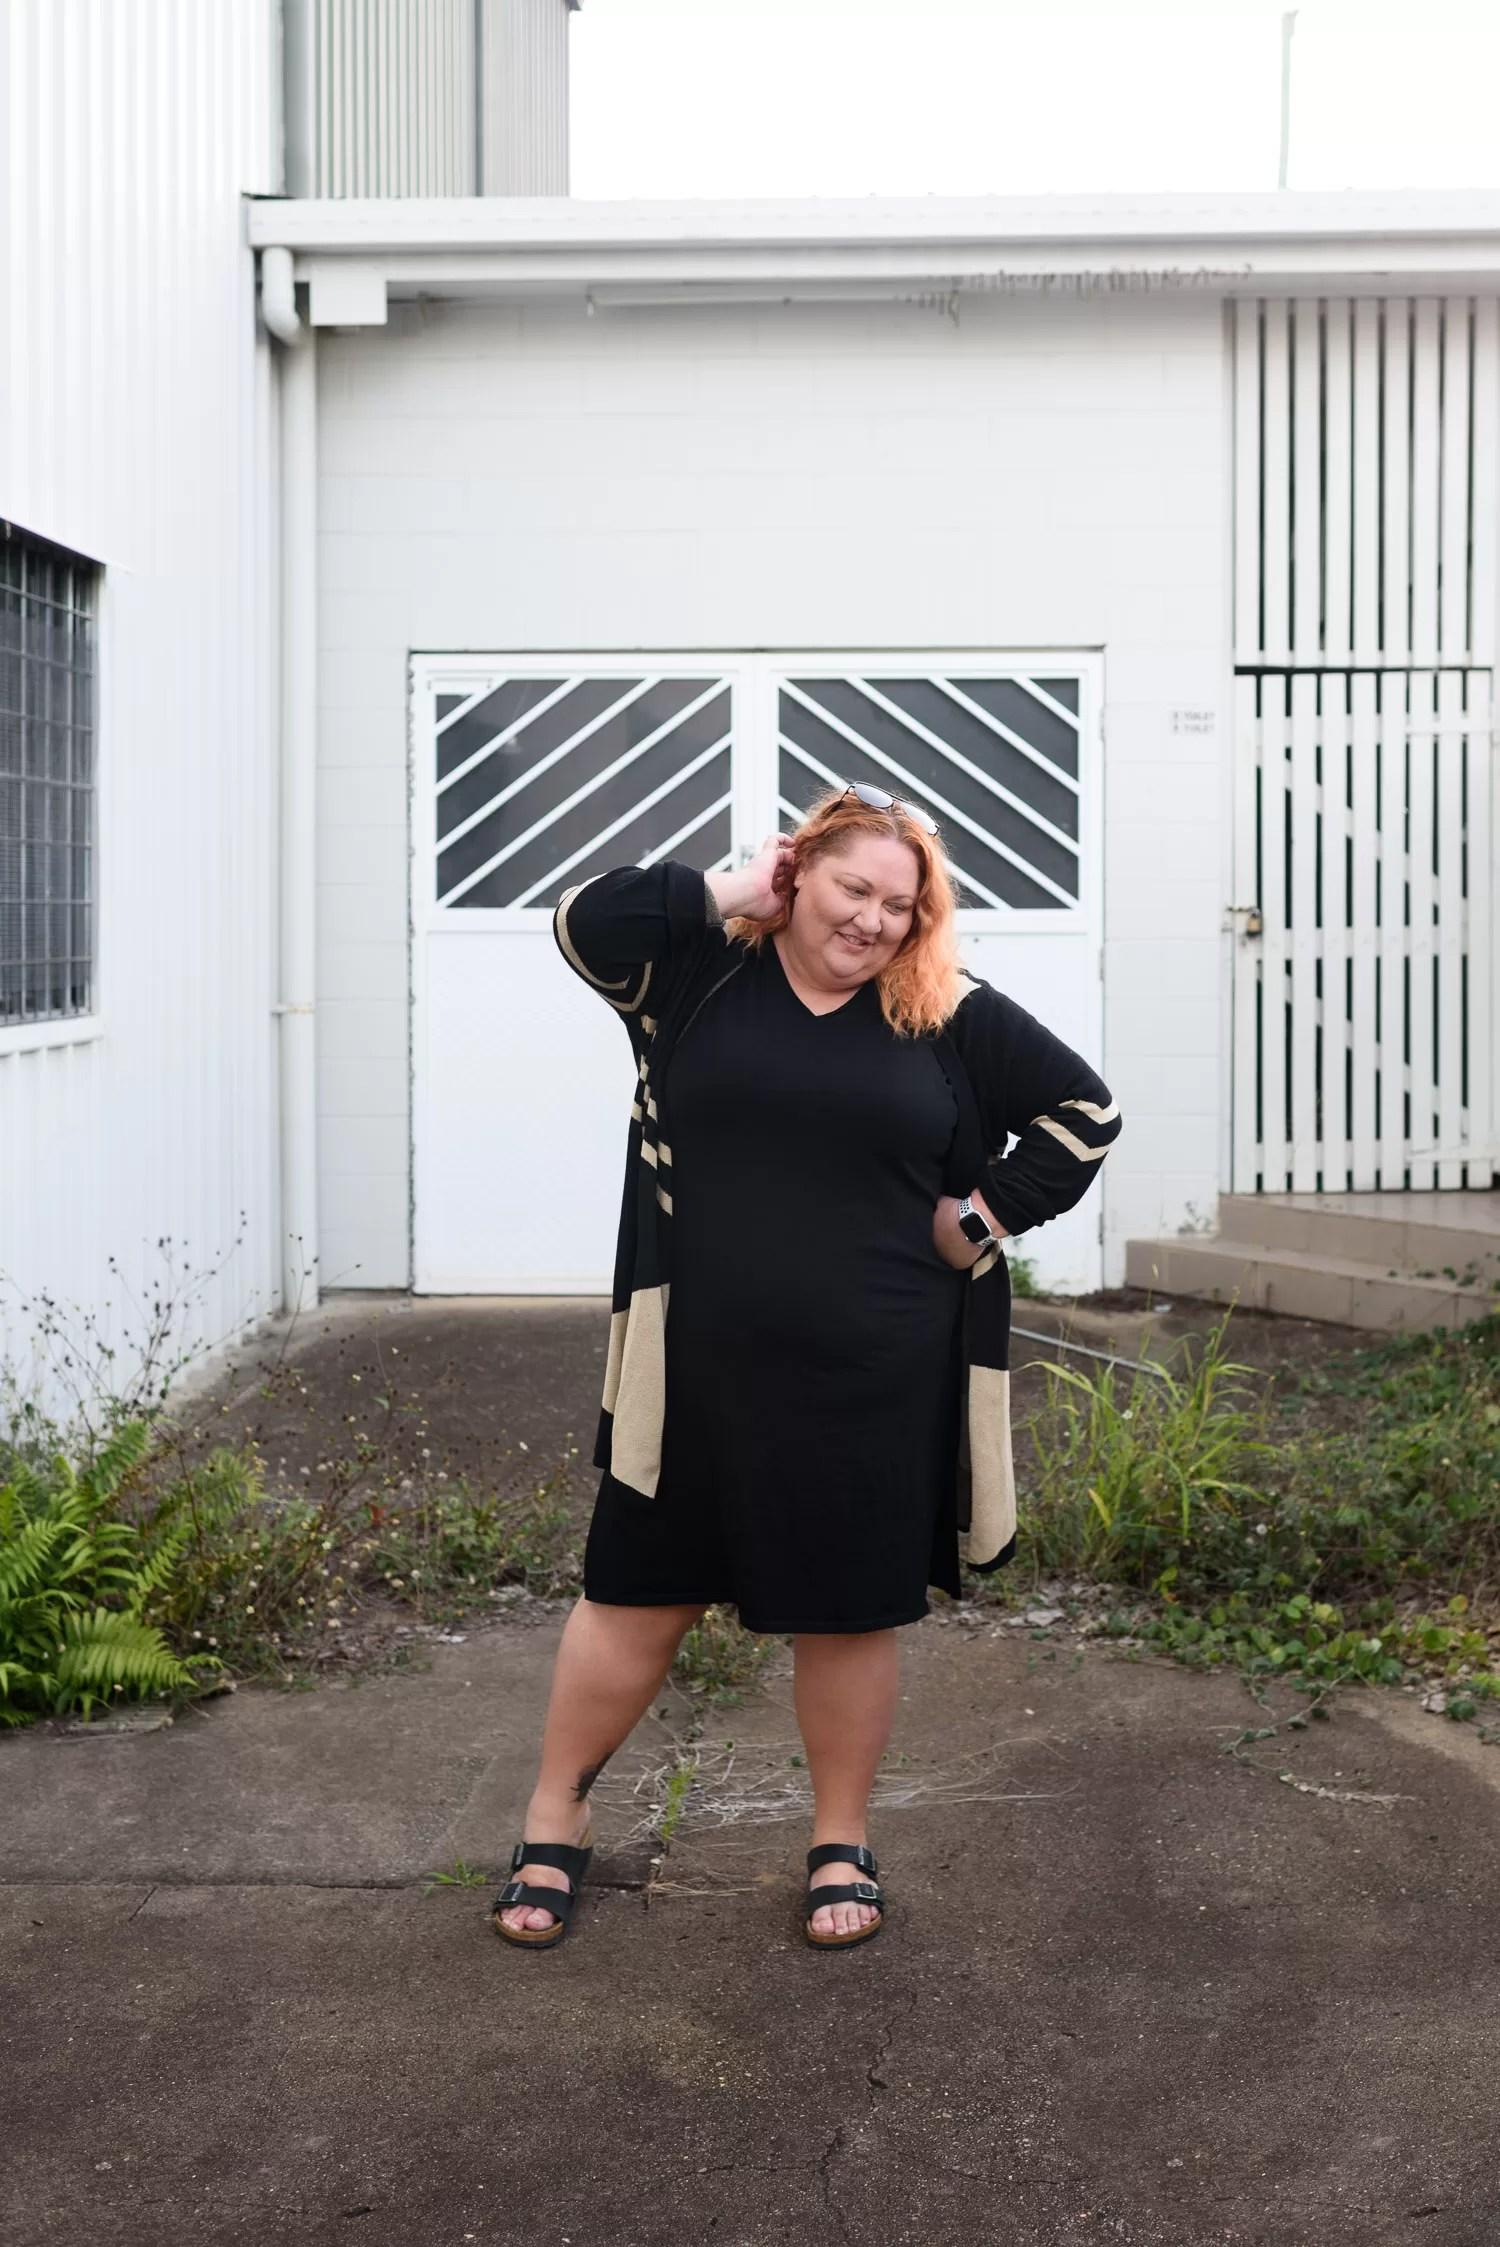 Plus Size Longline Cardigan Casual Birkenstock Outfit - Suger Coat It